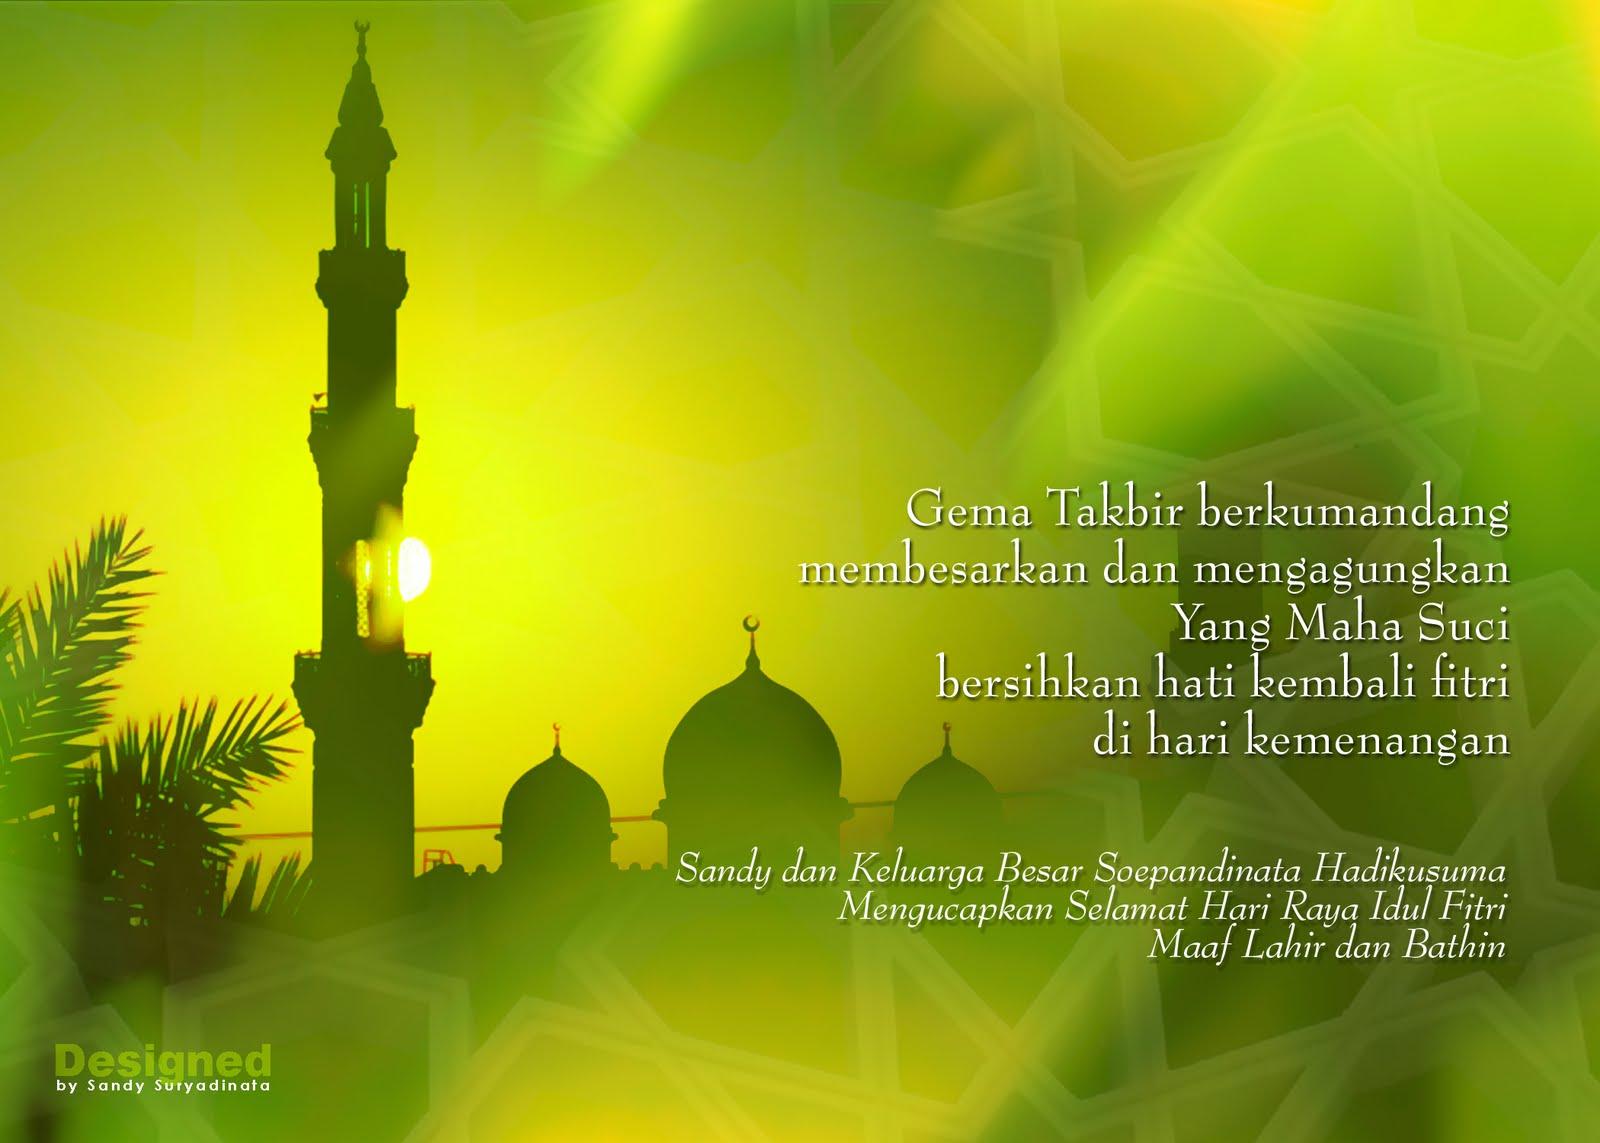 Selamat Hari Raya Idul Fitri 1431 H Balkam